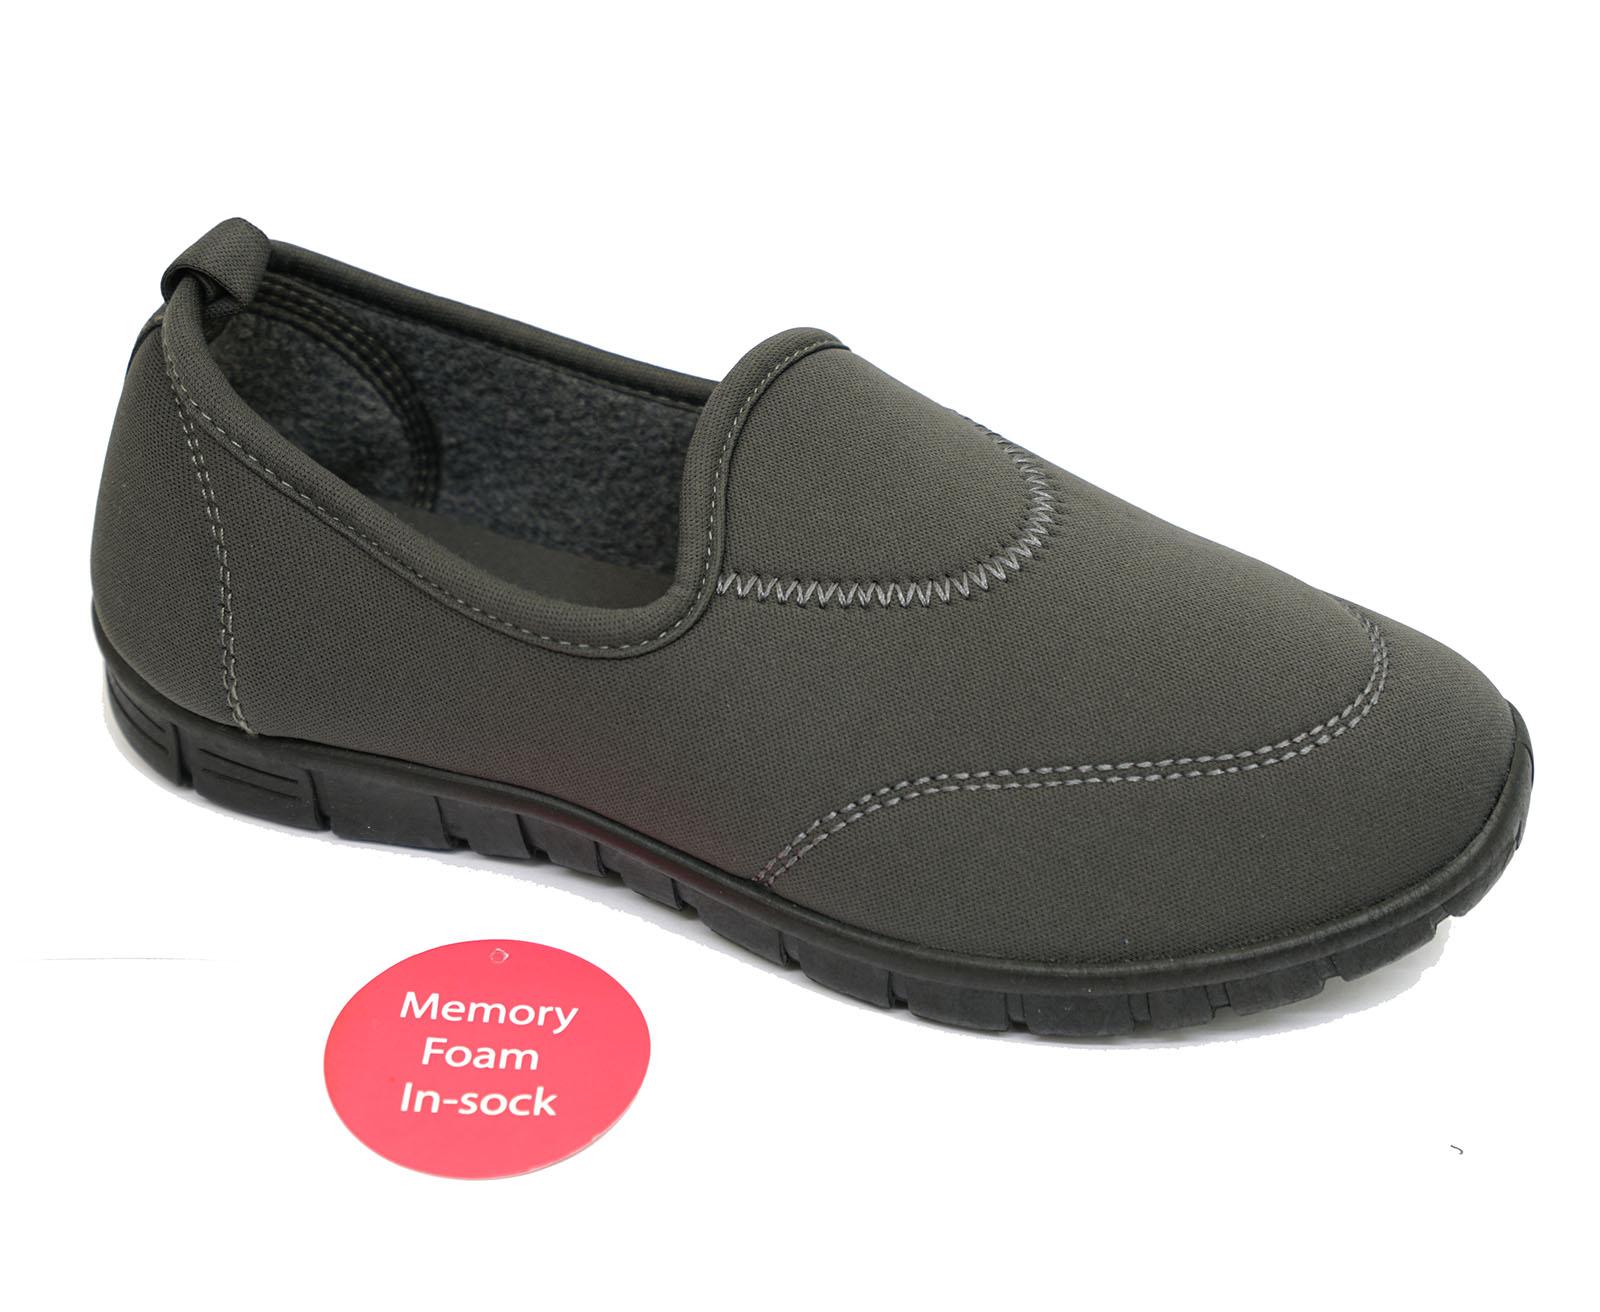 LADIES GREY SLIP-ON MEMORY FOAM COMFORT WALKING TRAINER PUMPS SHOES UK 3-8